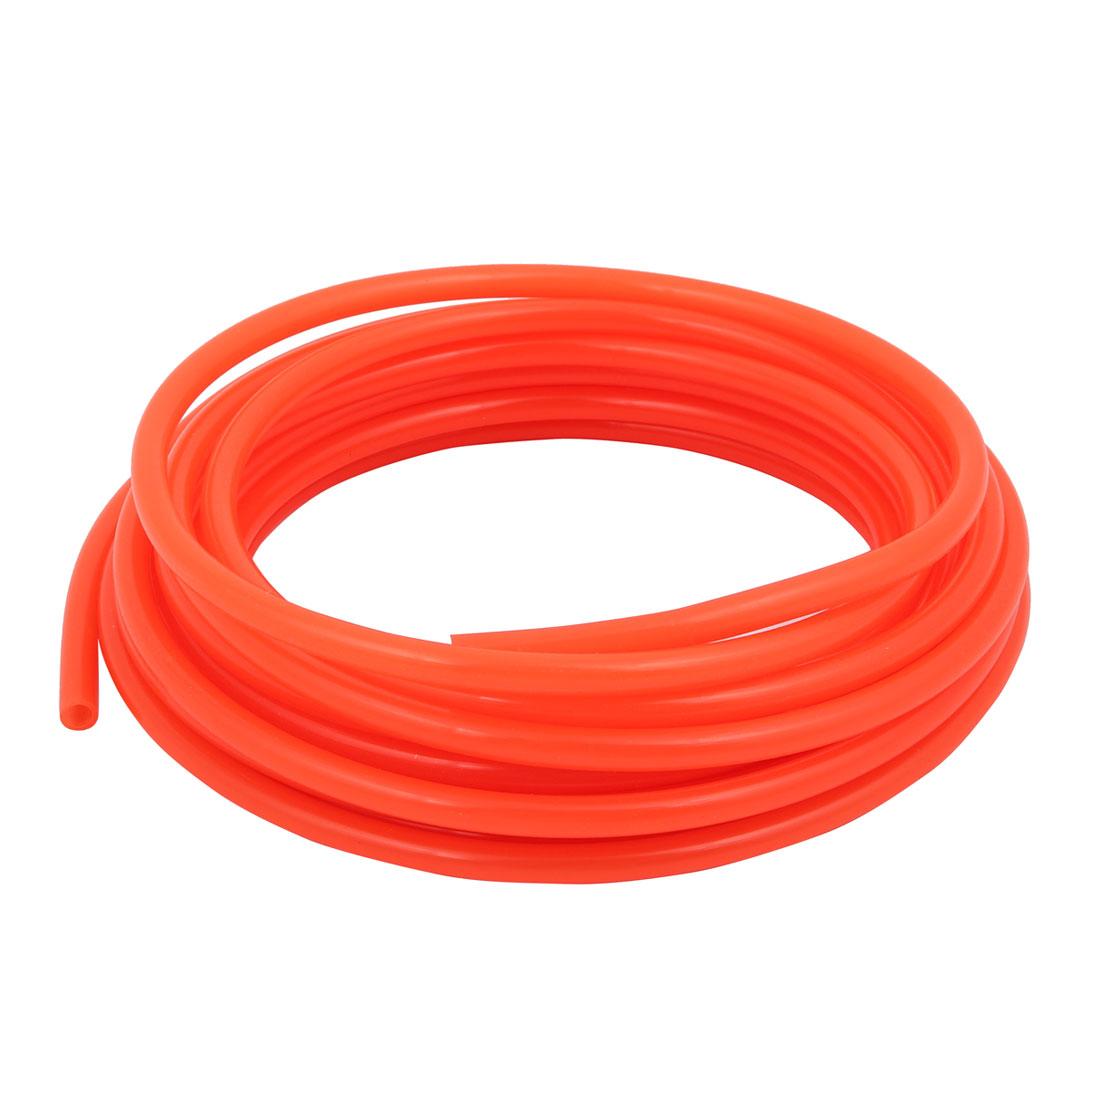 9M Length 8mm x 5mm Diameter Quick Connector Polyurethane Tube PU Air Pipe